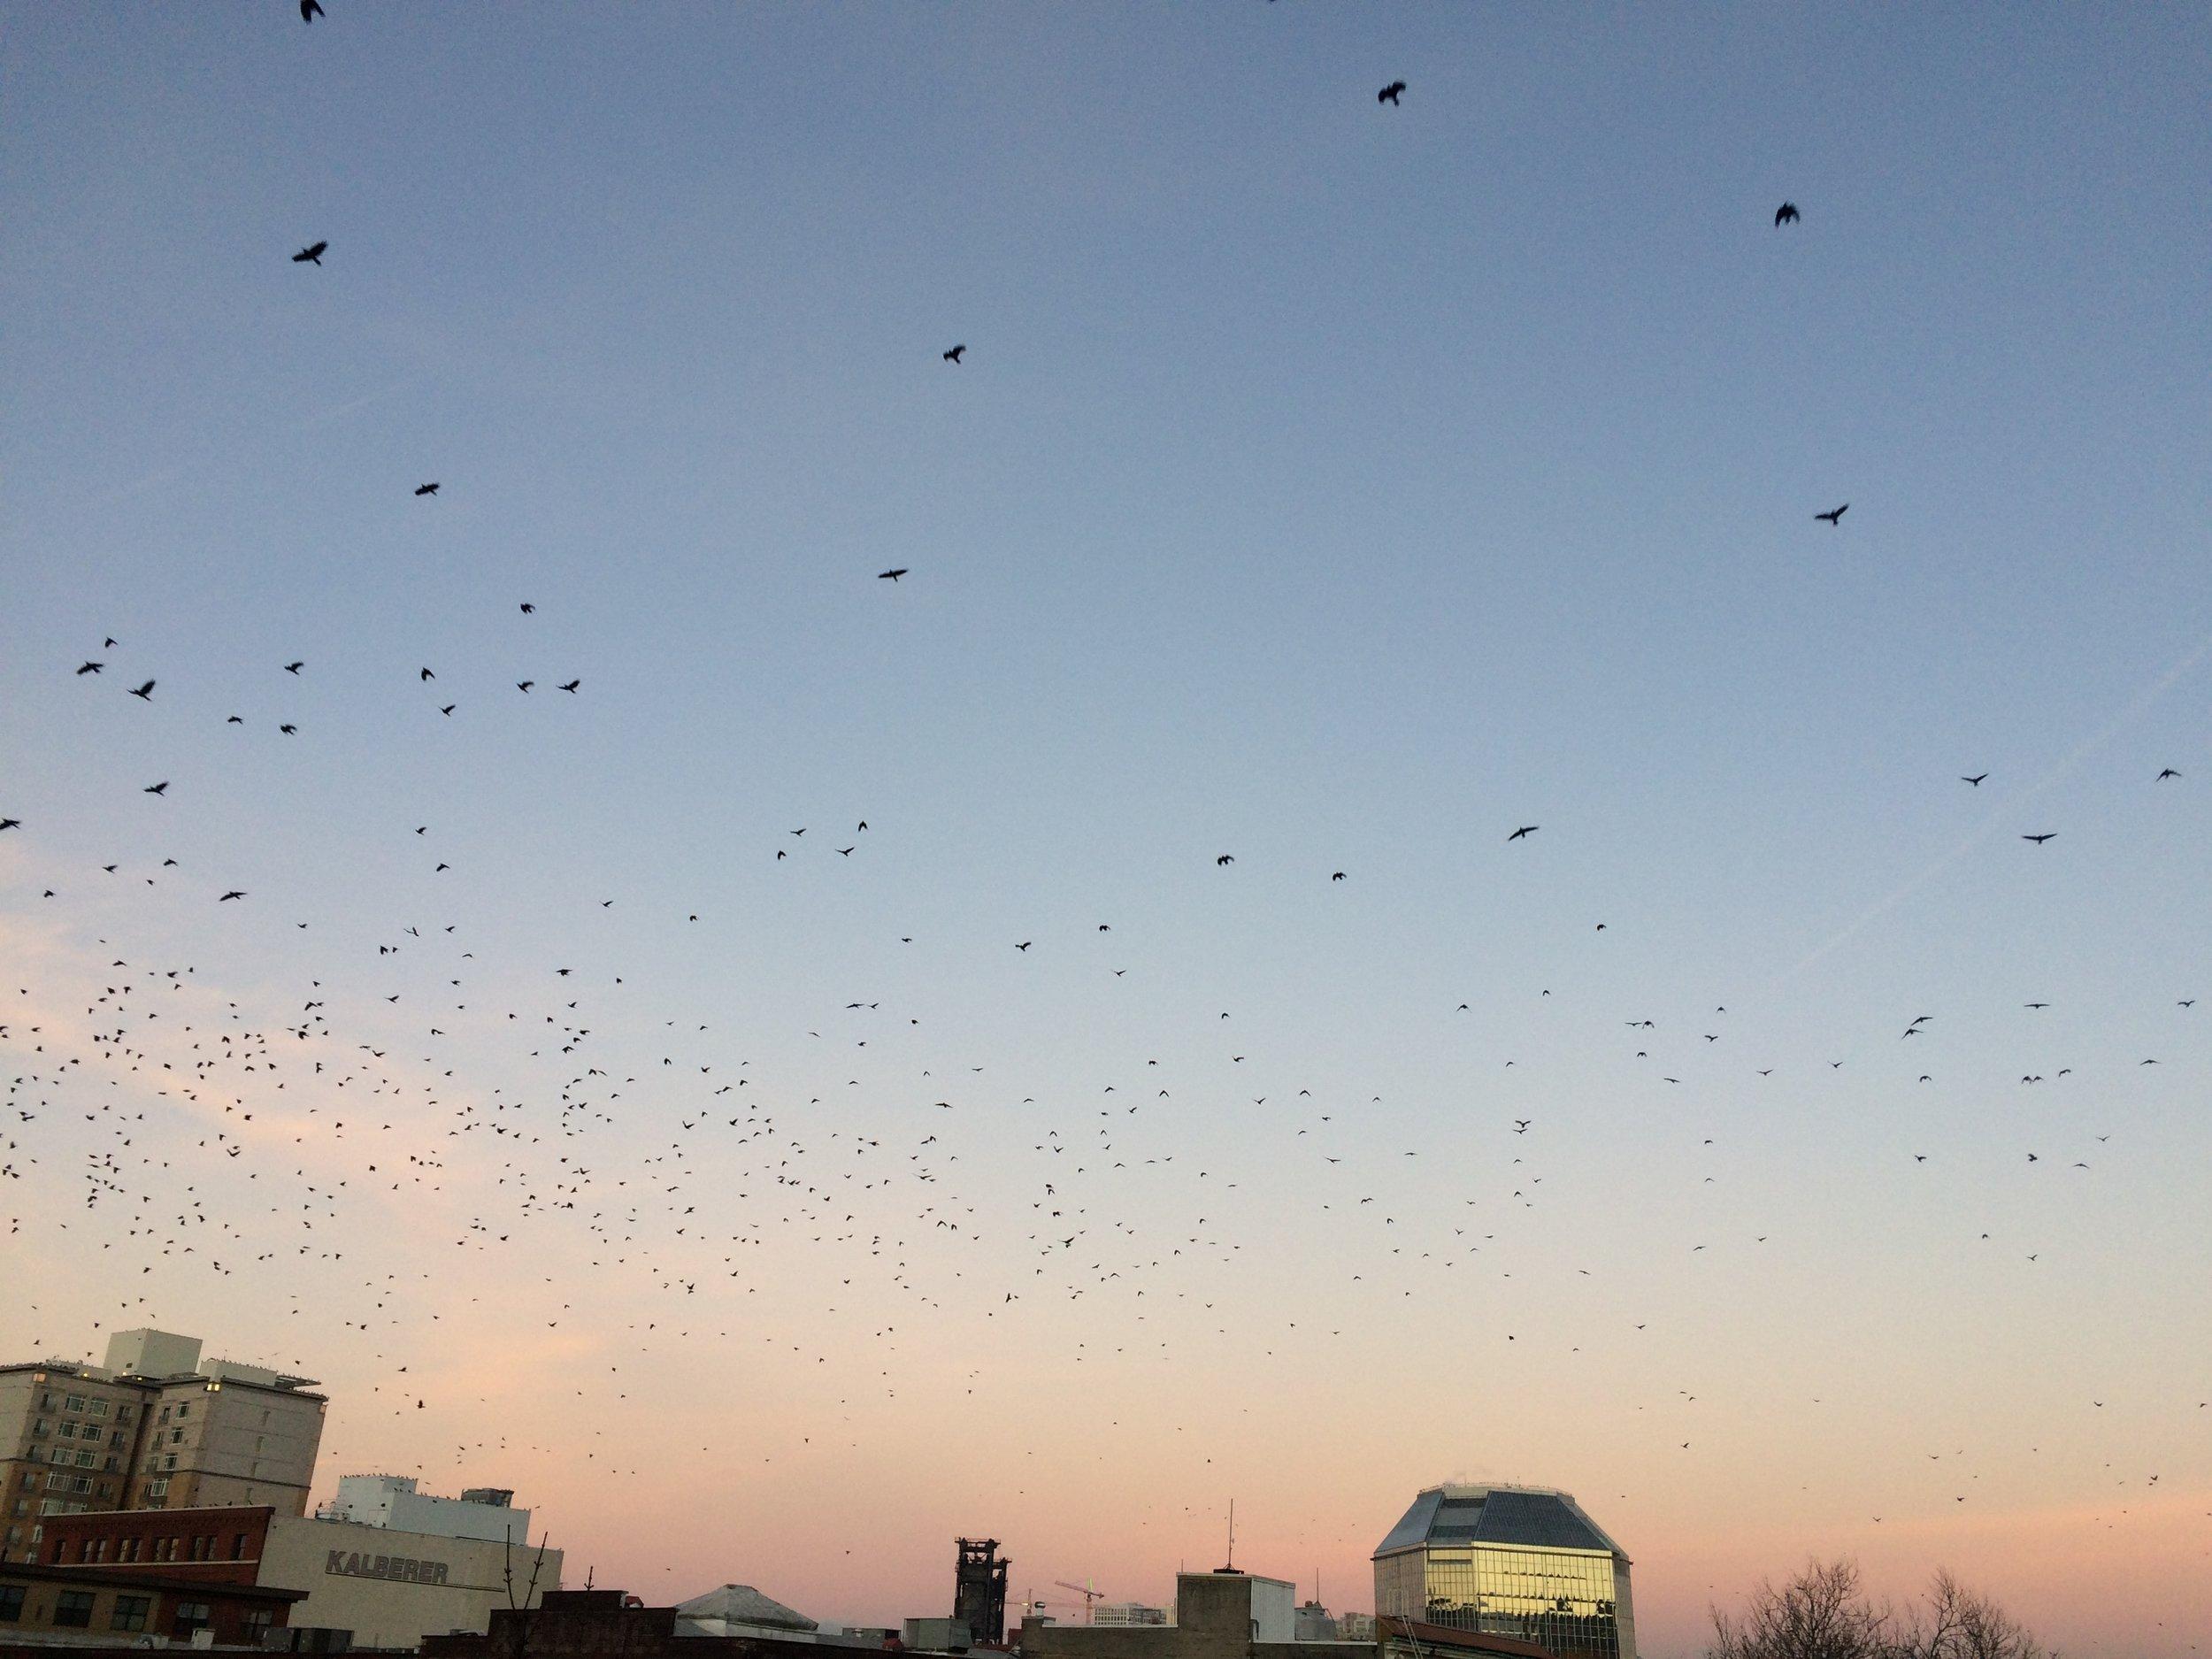 Migrating crows at night